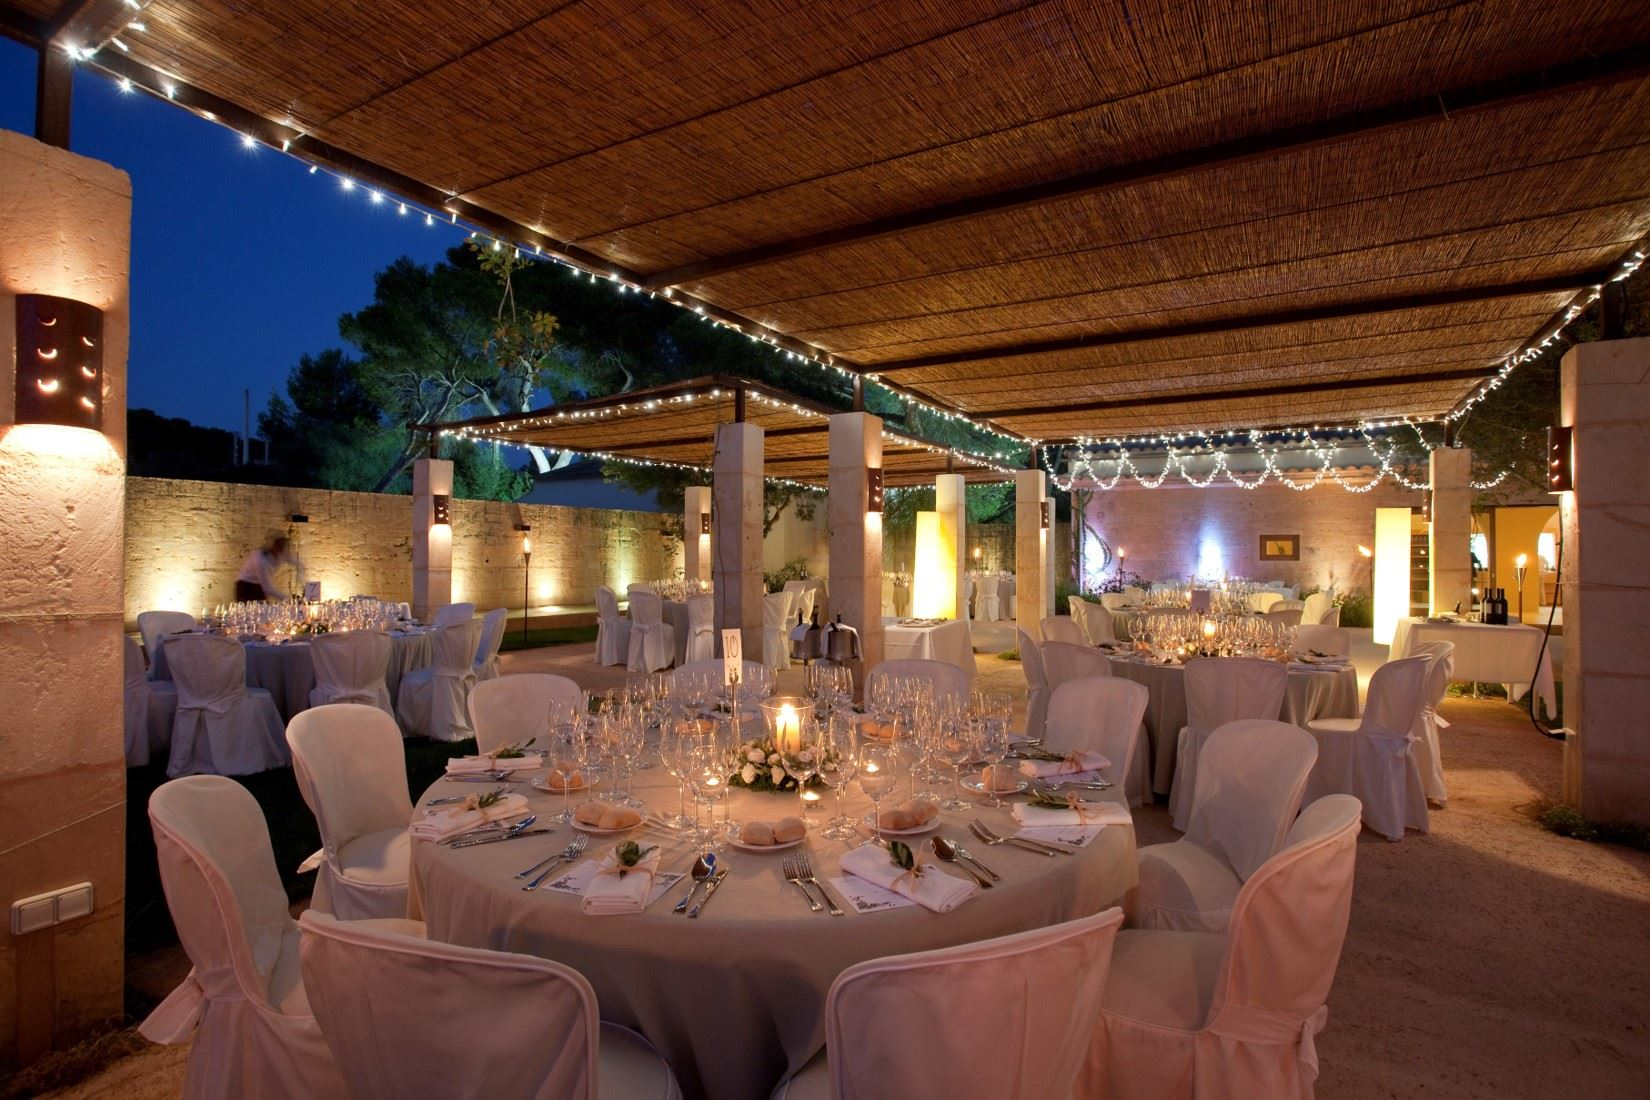 Restaurang på Fontsanta Hotel Thermal Spa & Wellness, Colonia de Sant Jordi Mallorca